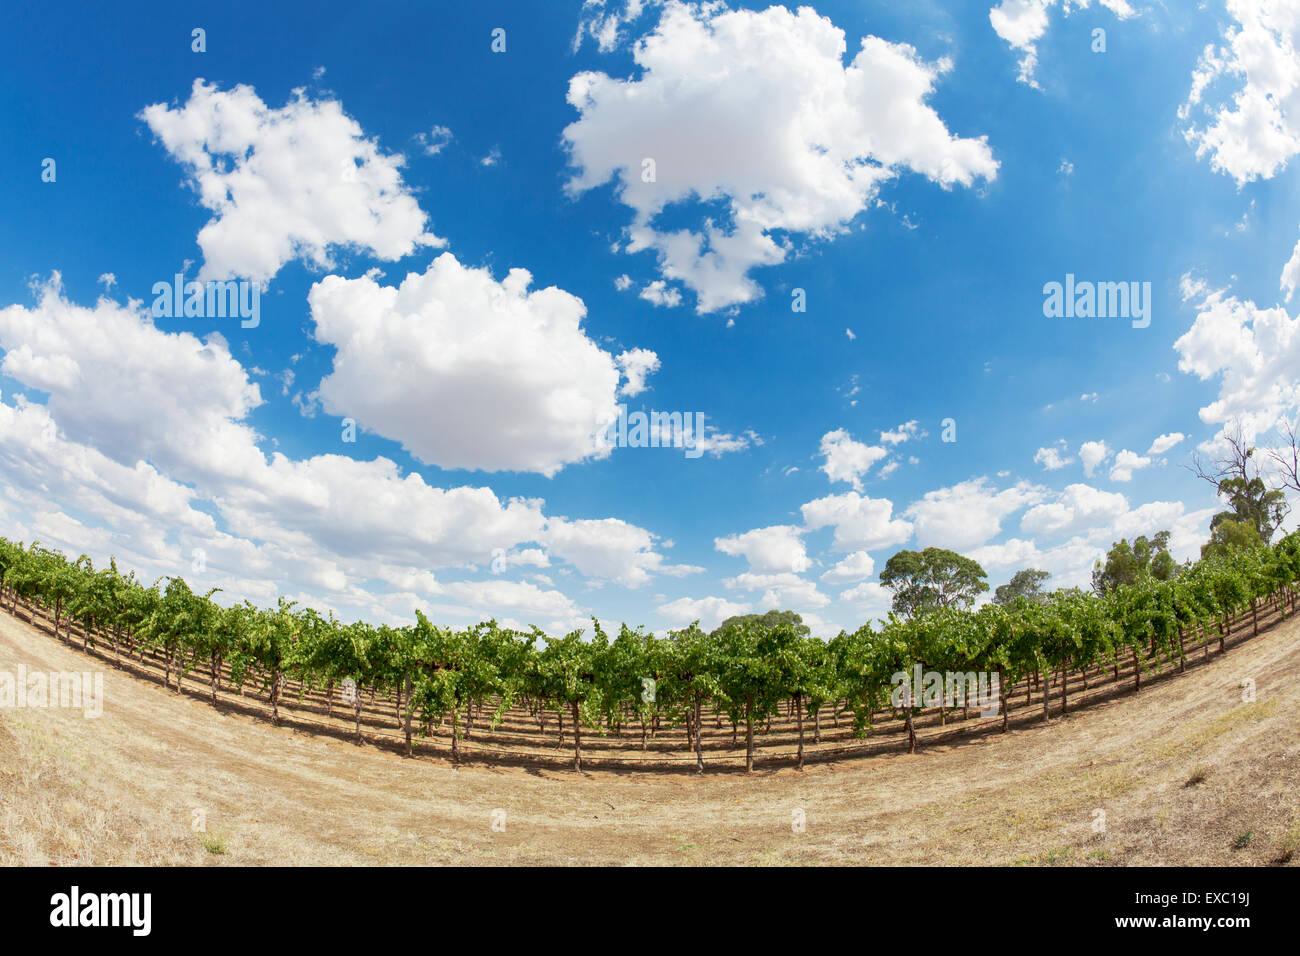 Vineyard - Stock Image